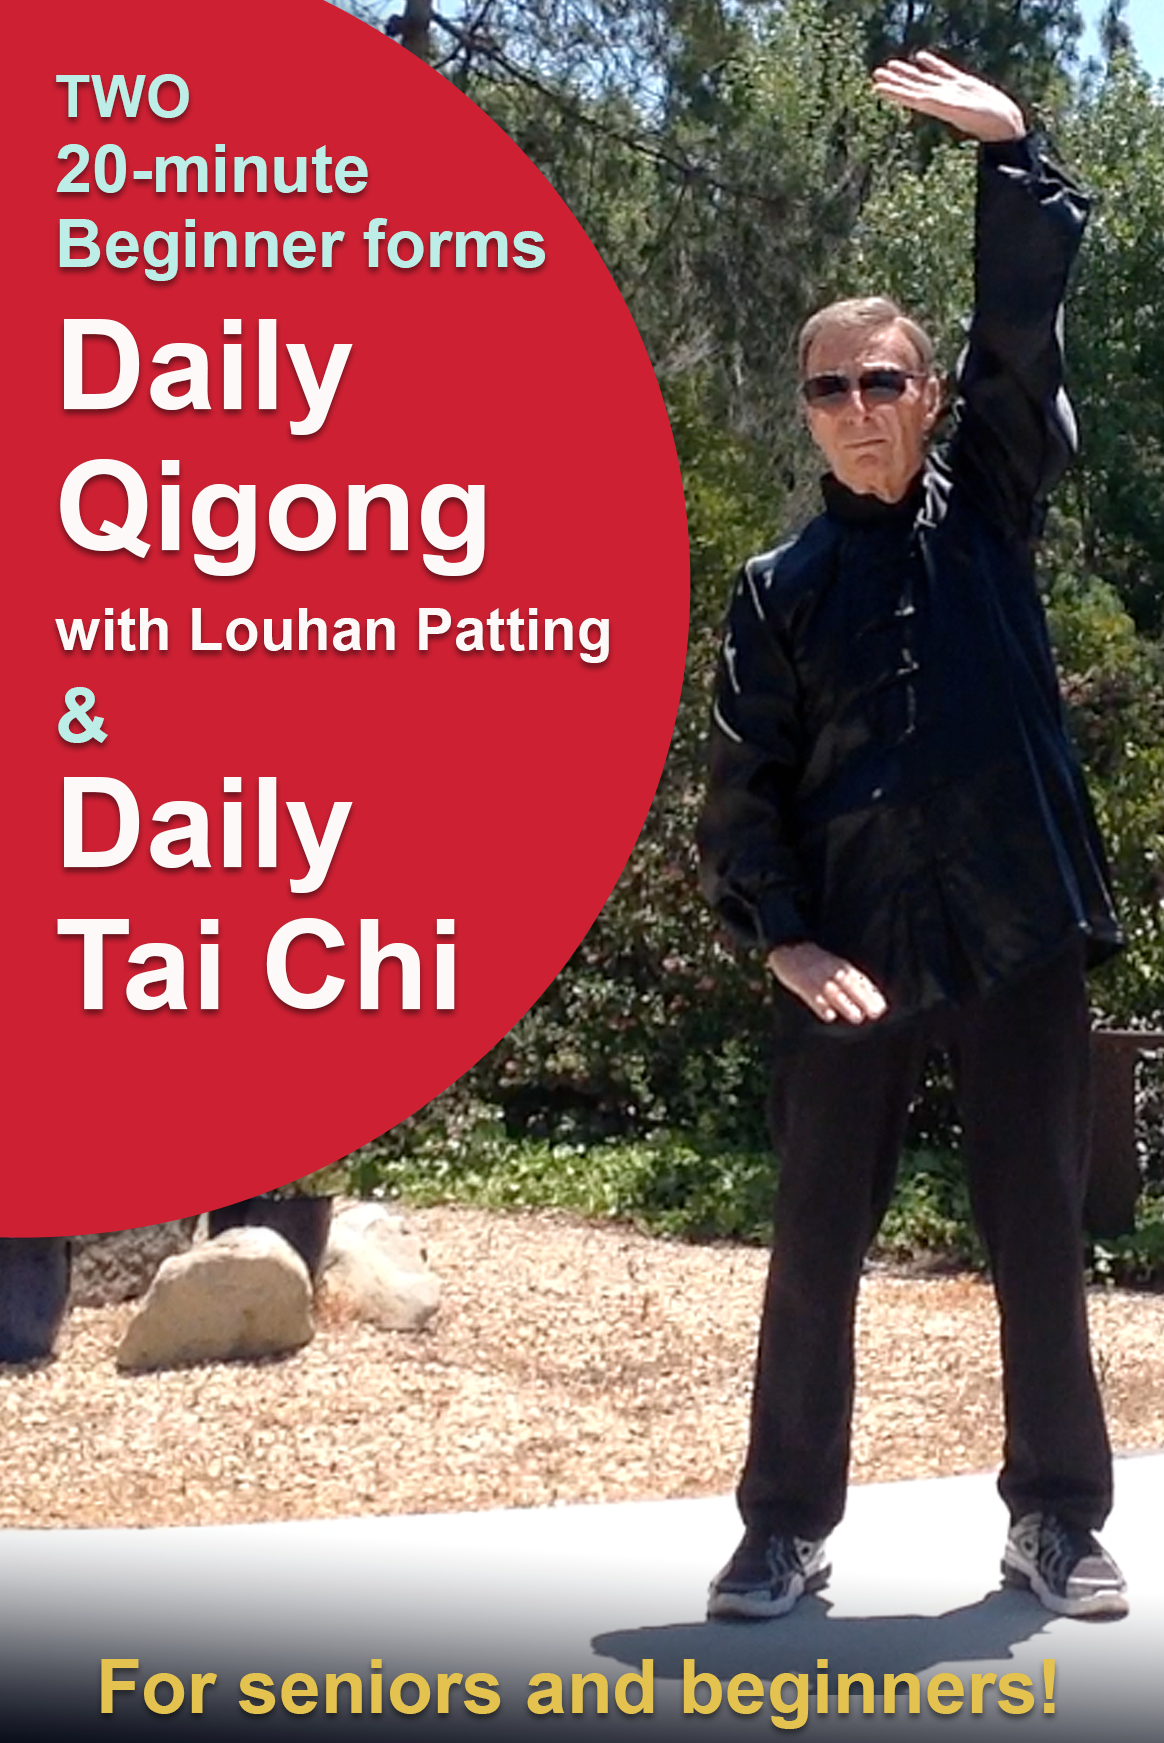 Easy Tai Chi and Qigong